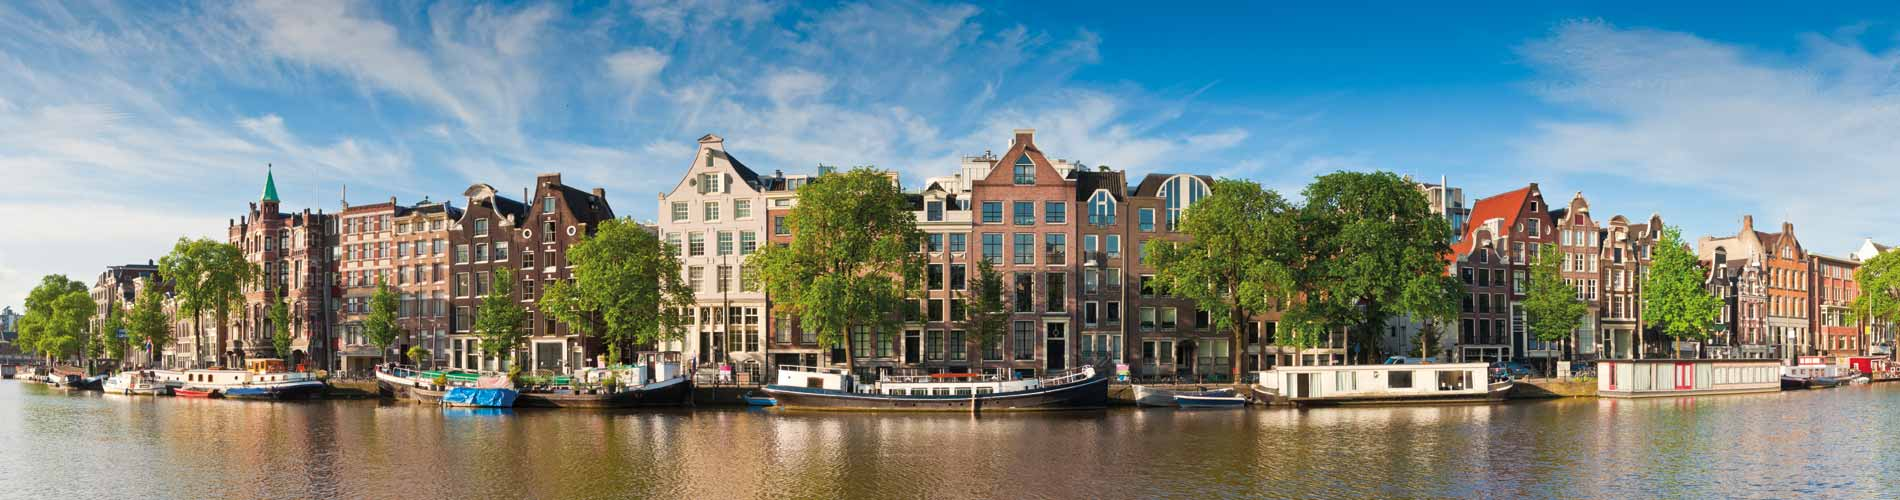 Blog_EuropeanCapitalCulture_Amsterdam_1900x500_Q120